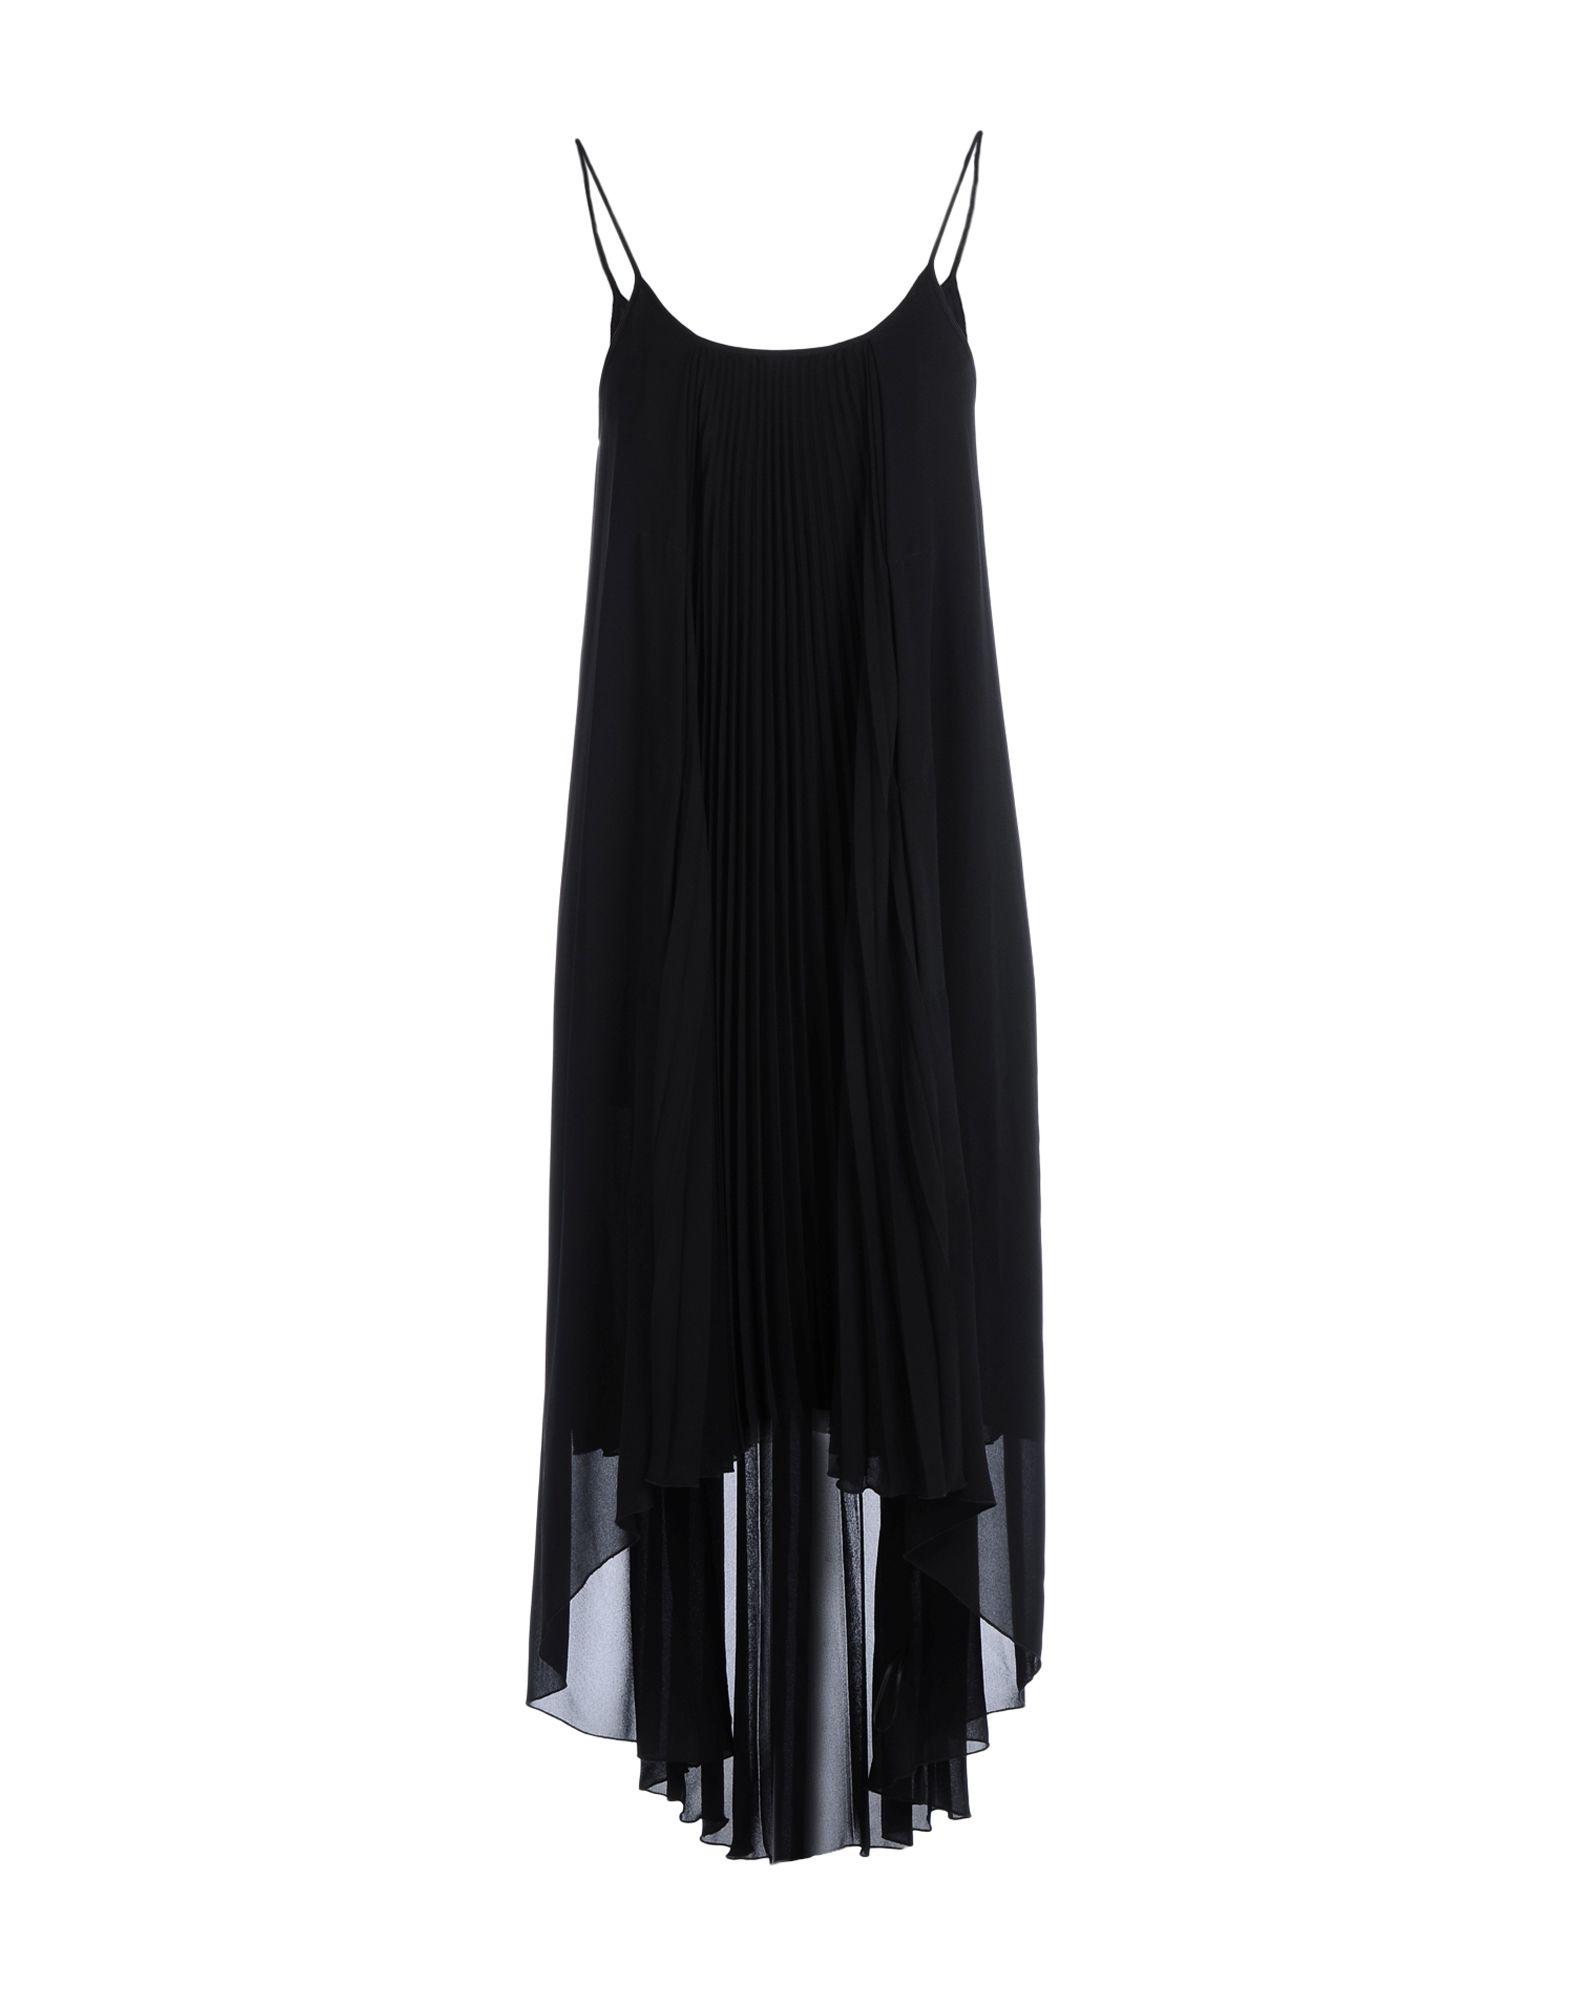 Women s dresses manila grace black knee length dress 186 111 free